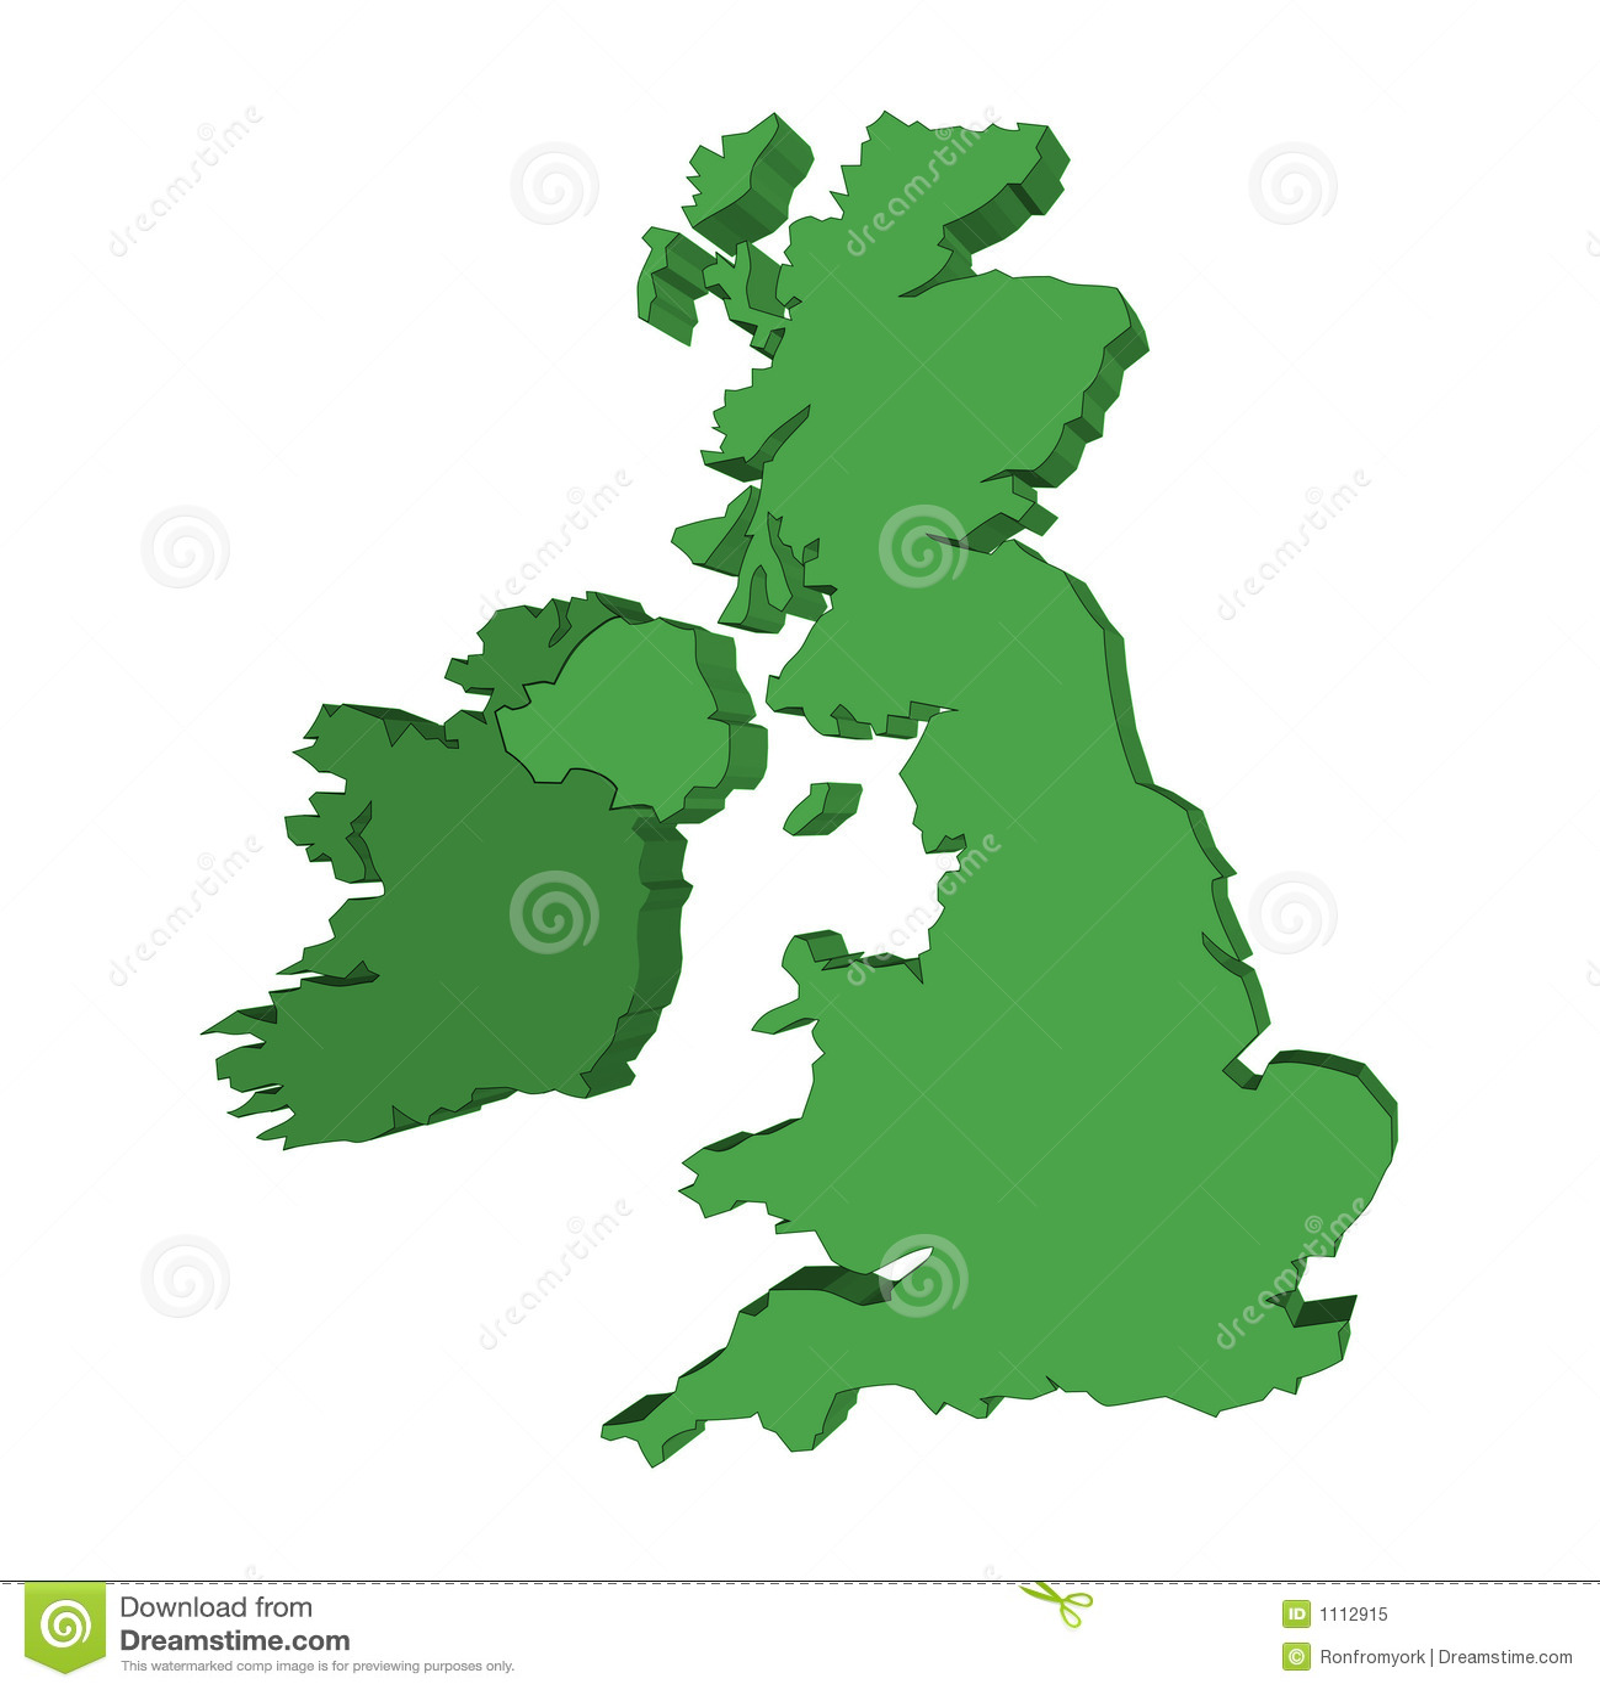 D UK And Ireland Map Stock Illustration Illustration Of Europe - Ireland map download